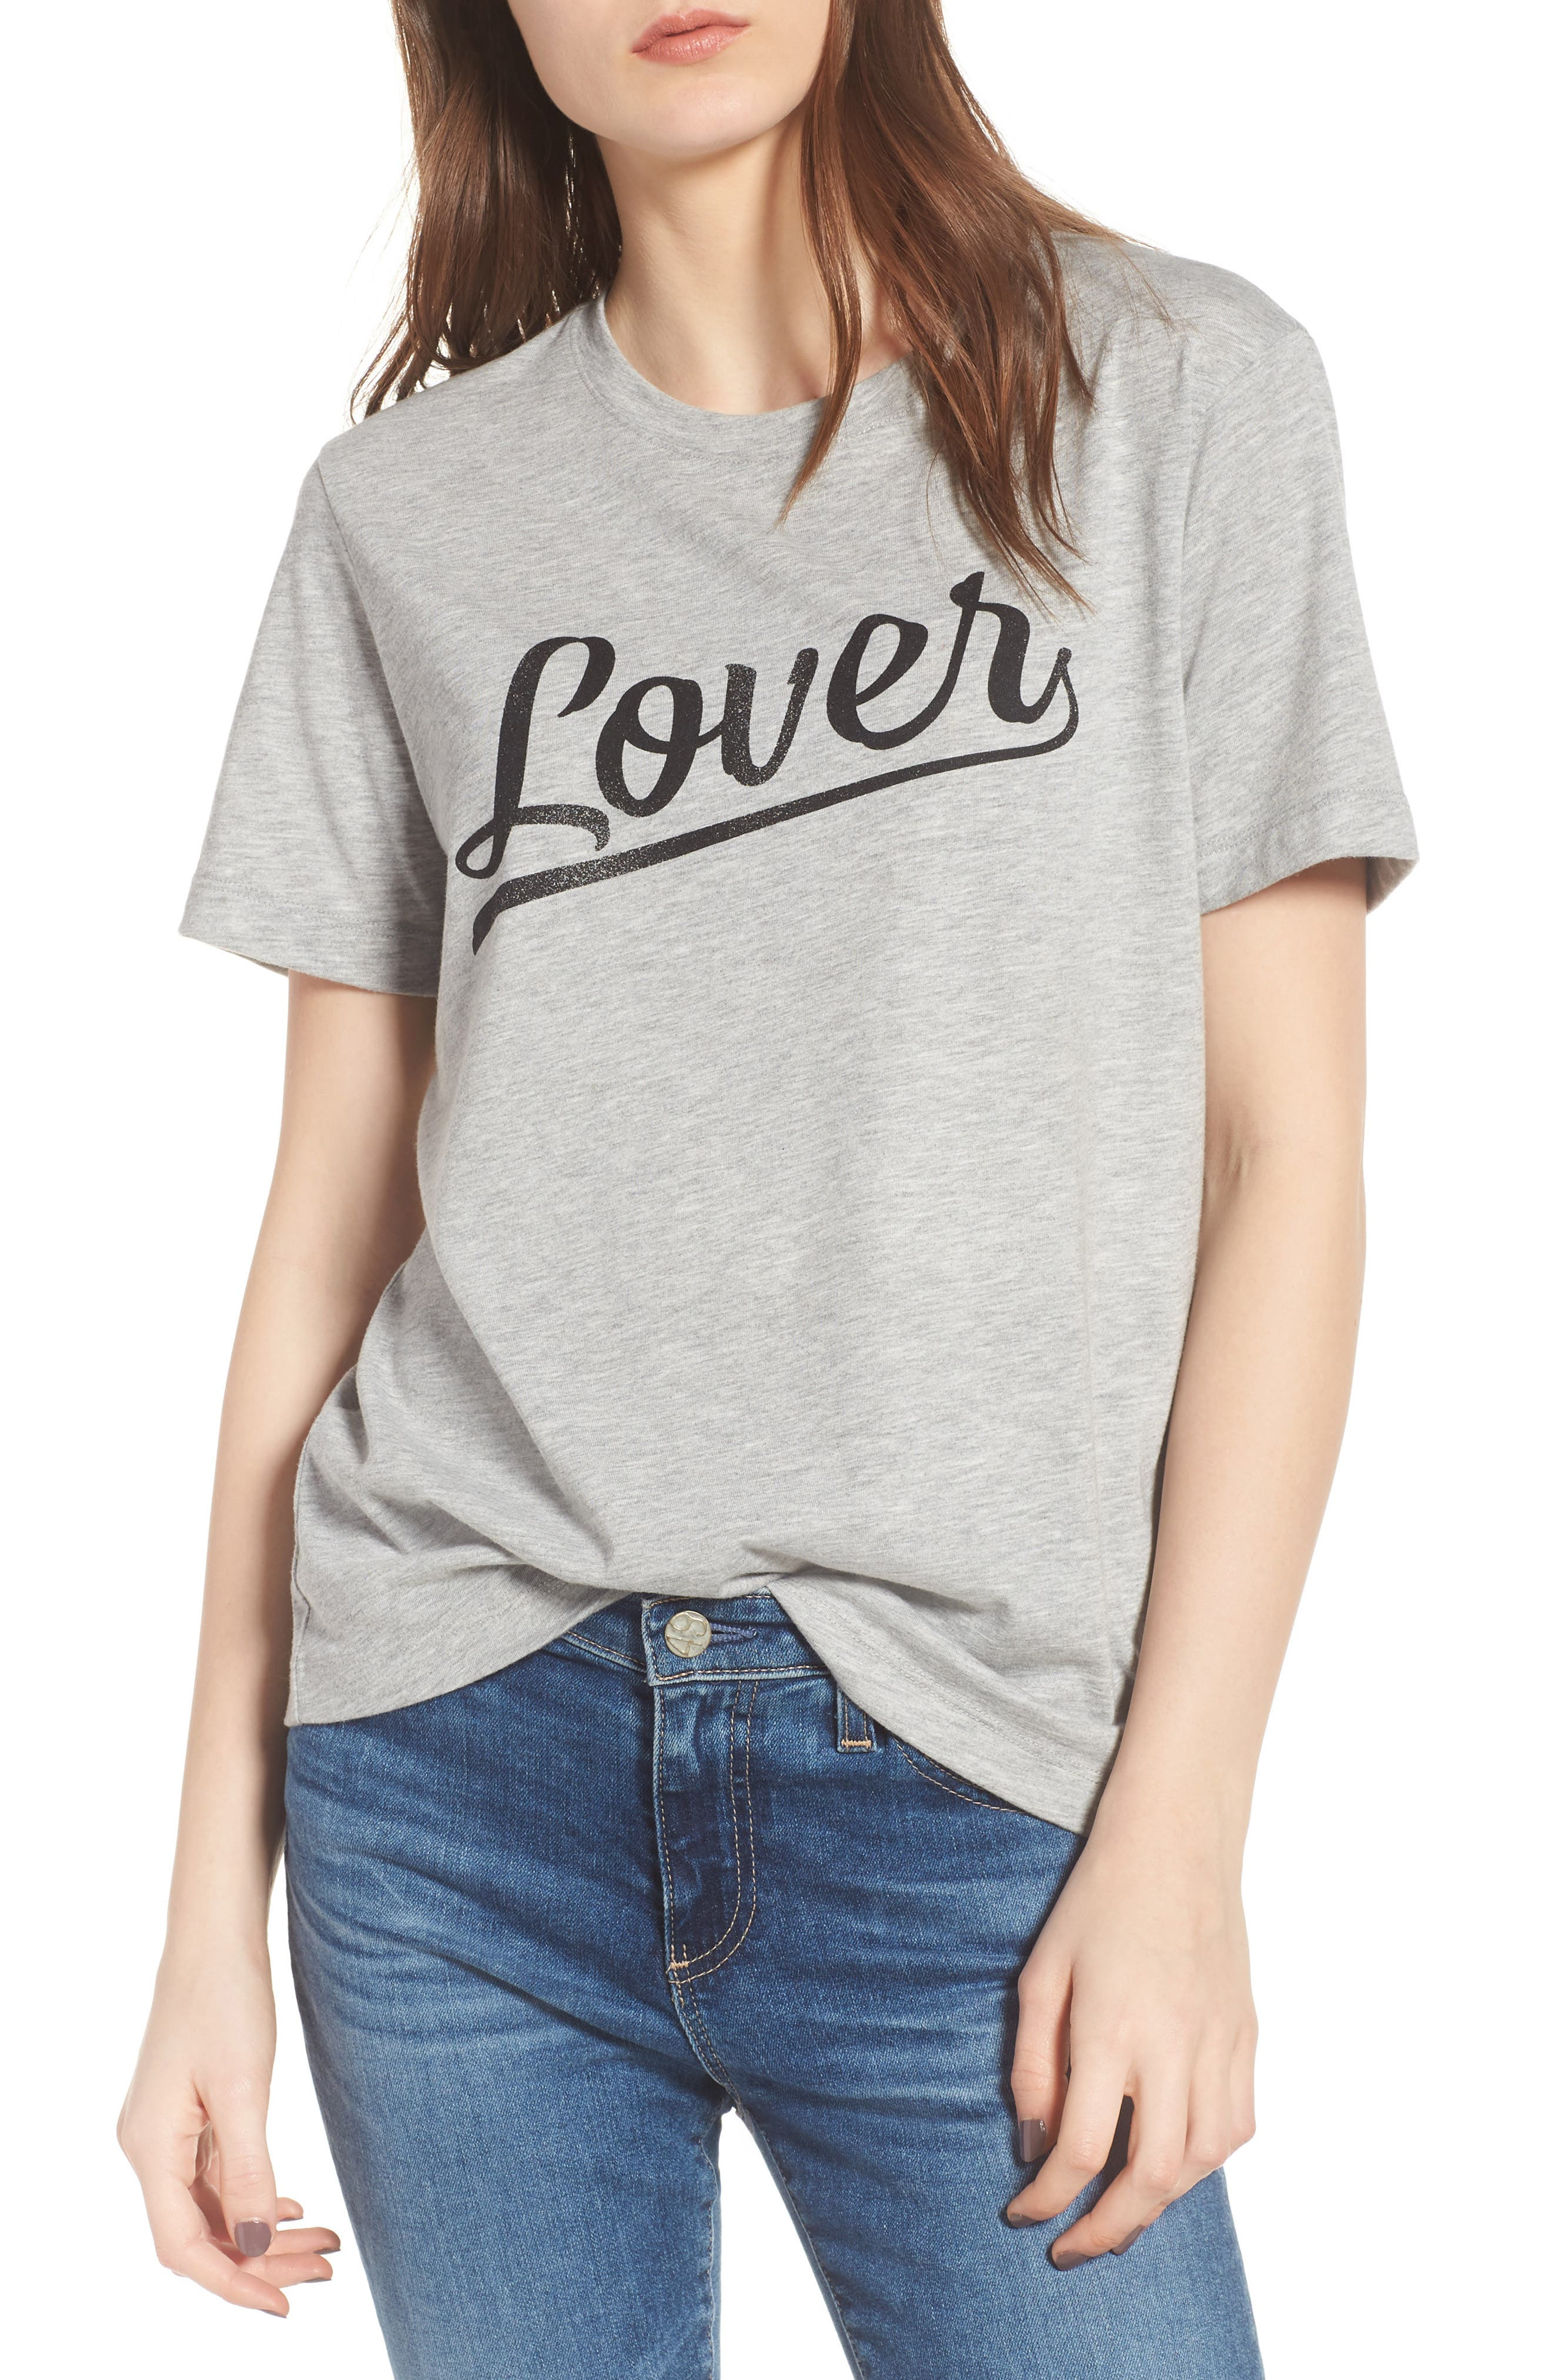 Lover Tee,                         Main,                         color, Heather Grey/ Black